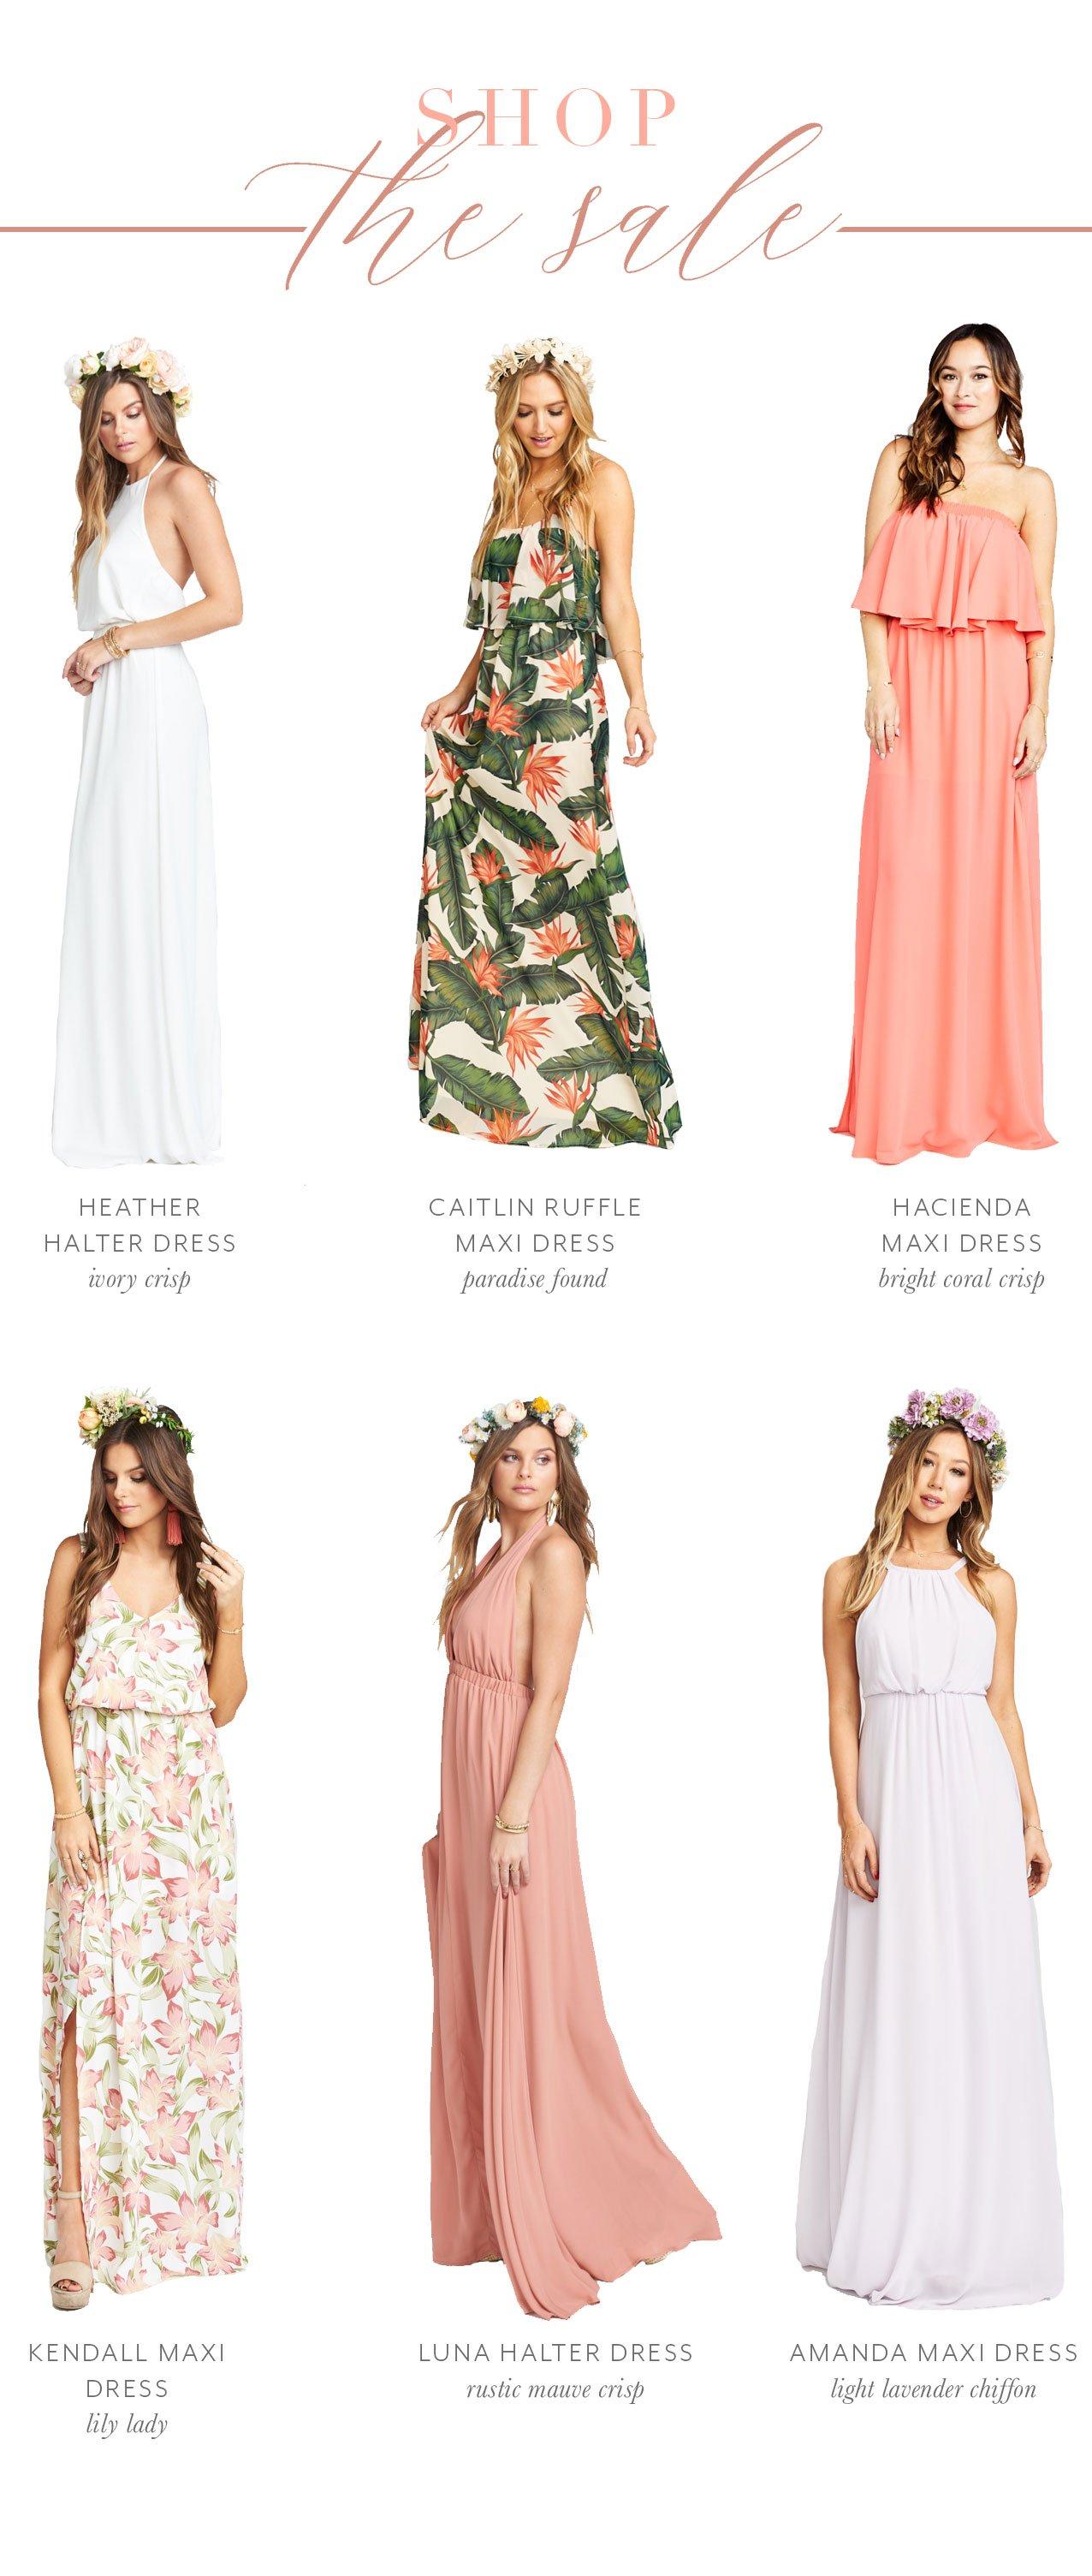 0c42f4185e235 Show Me Your Mumu: FLASH SALE! 40% OFF Select Bridesmaids Dresses ...